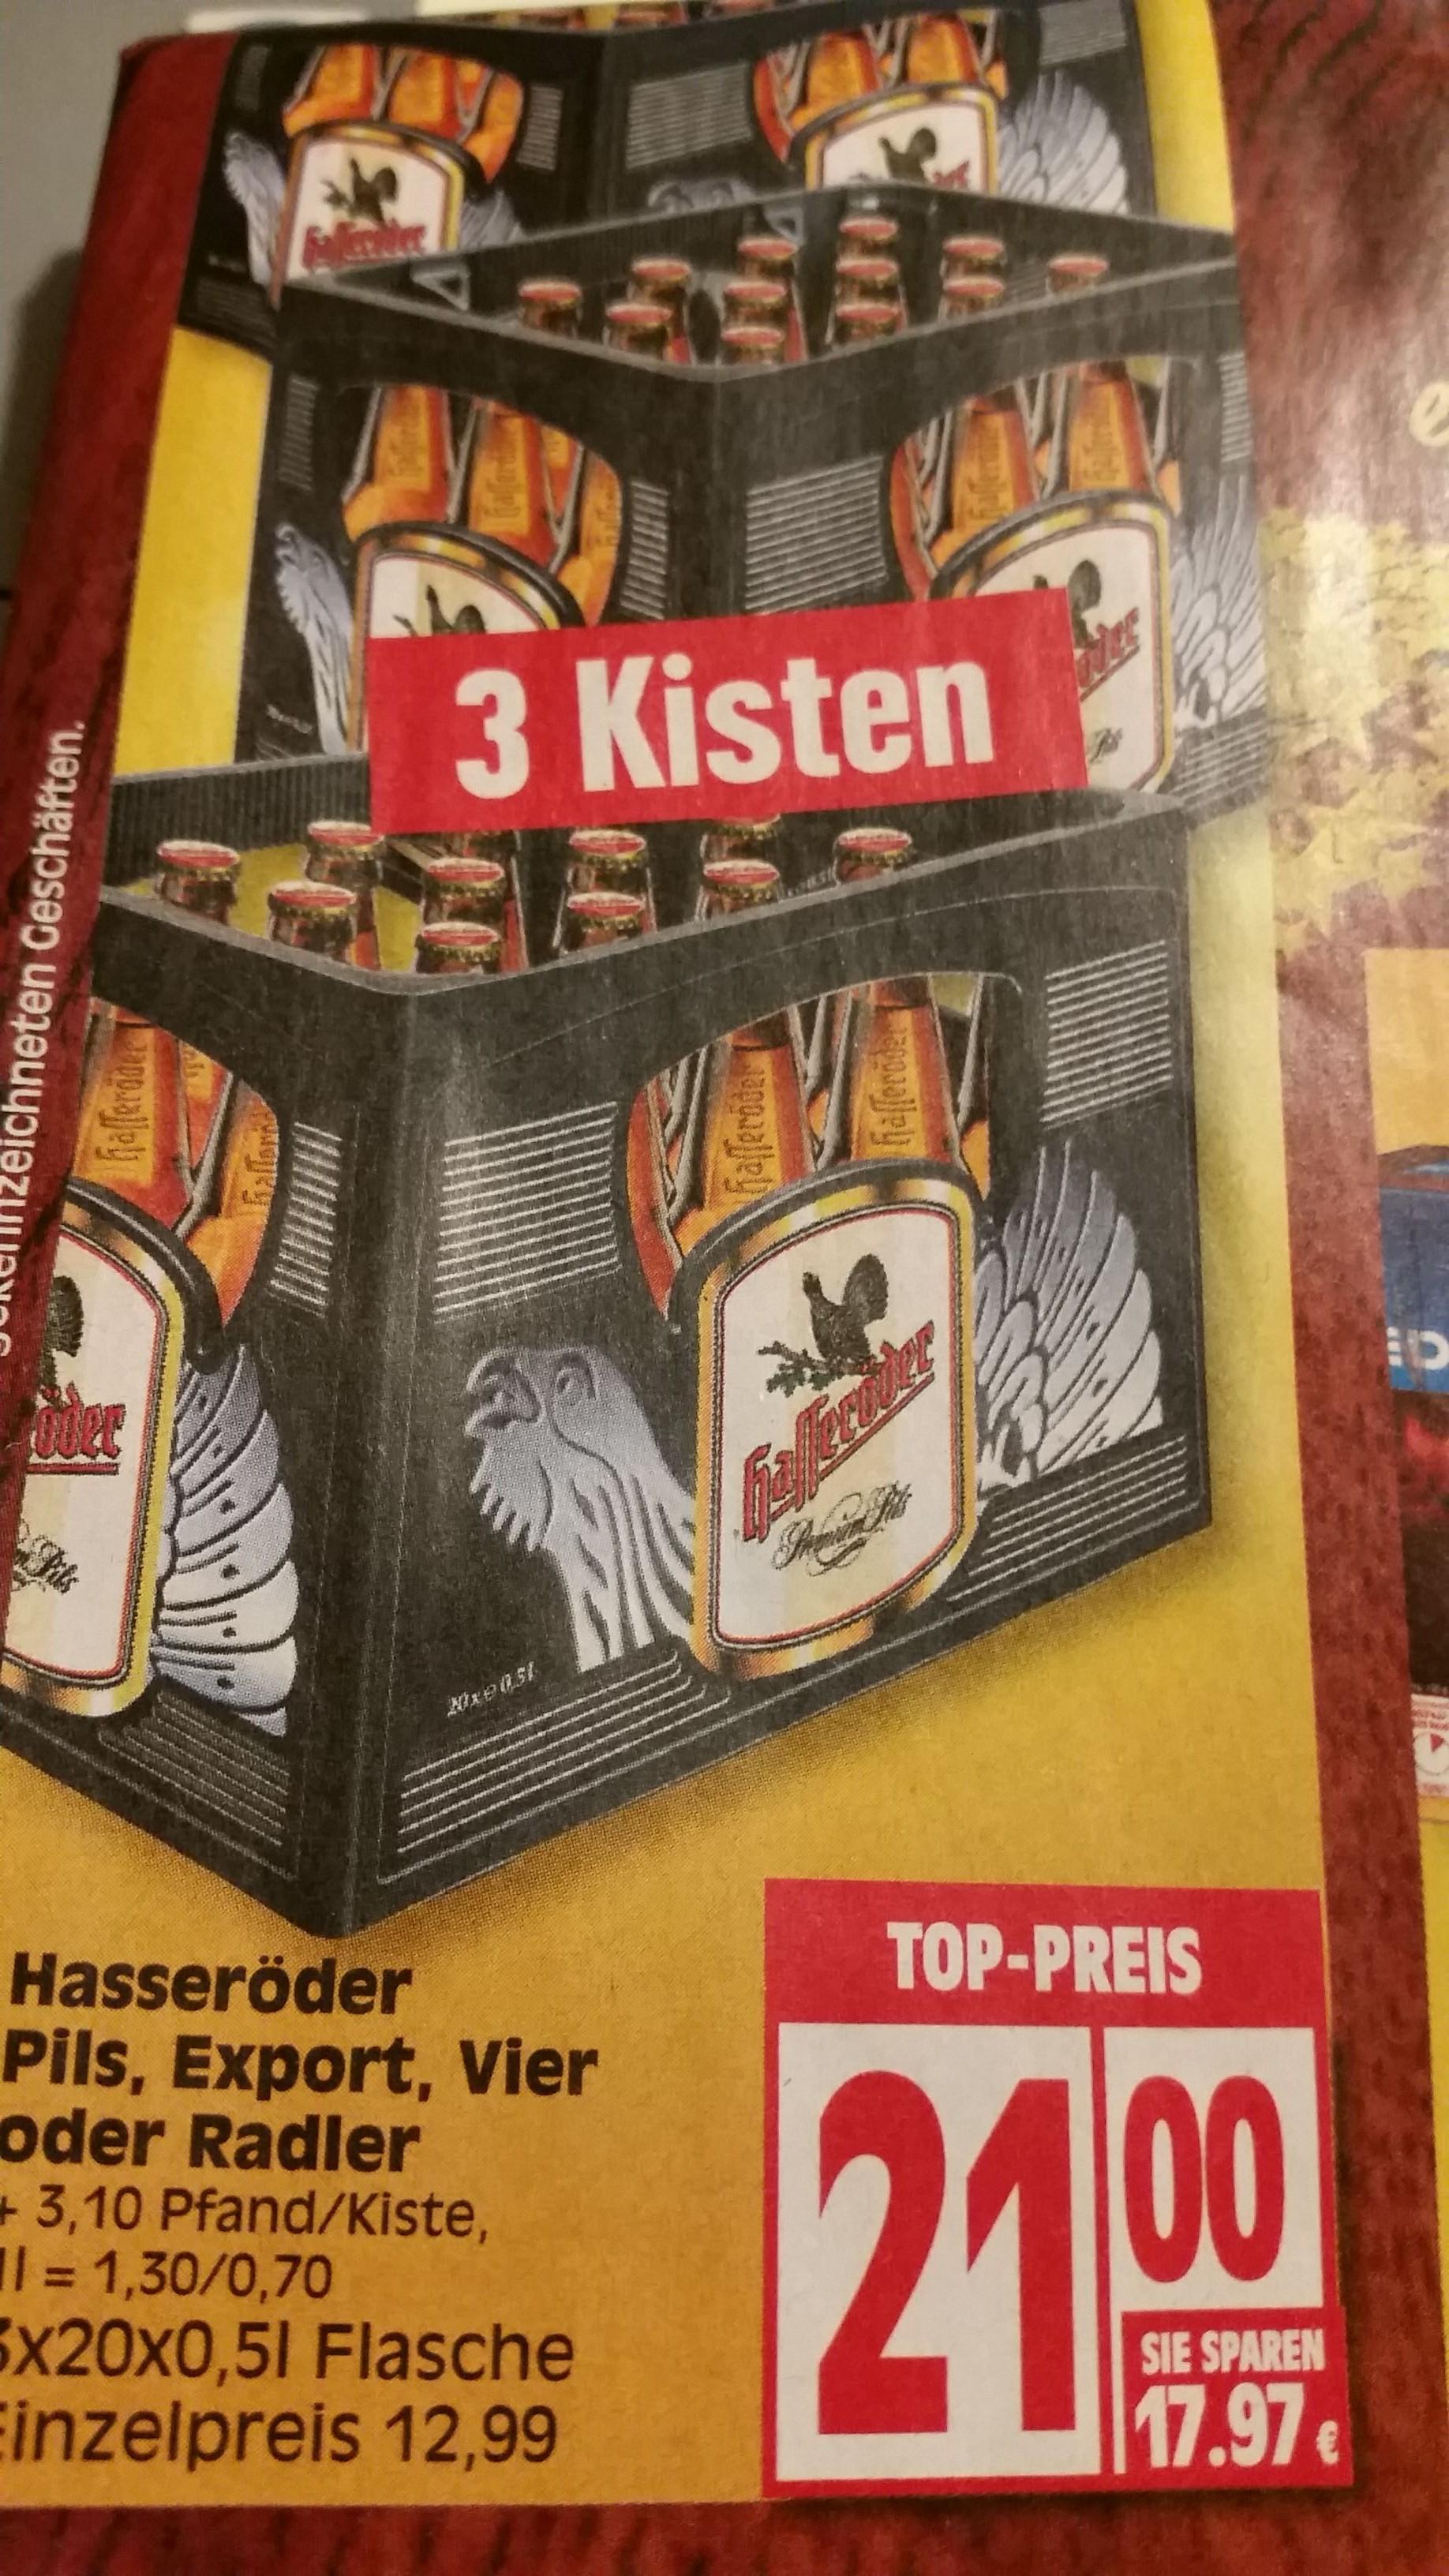 [Lokal?] Edeka 3 Kisten Hasseröder für 21€ = 7€ je Kiste!